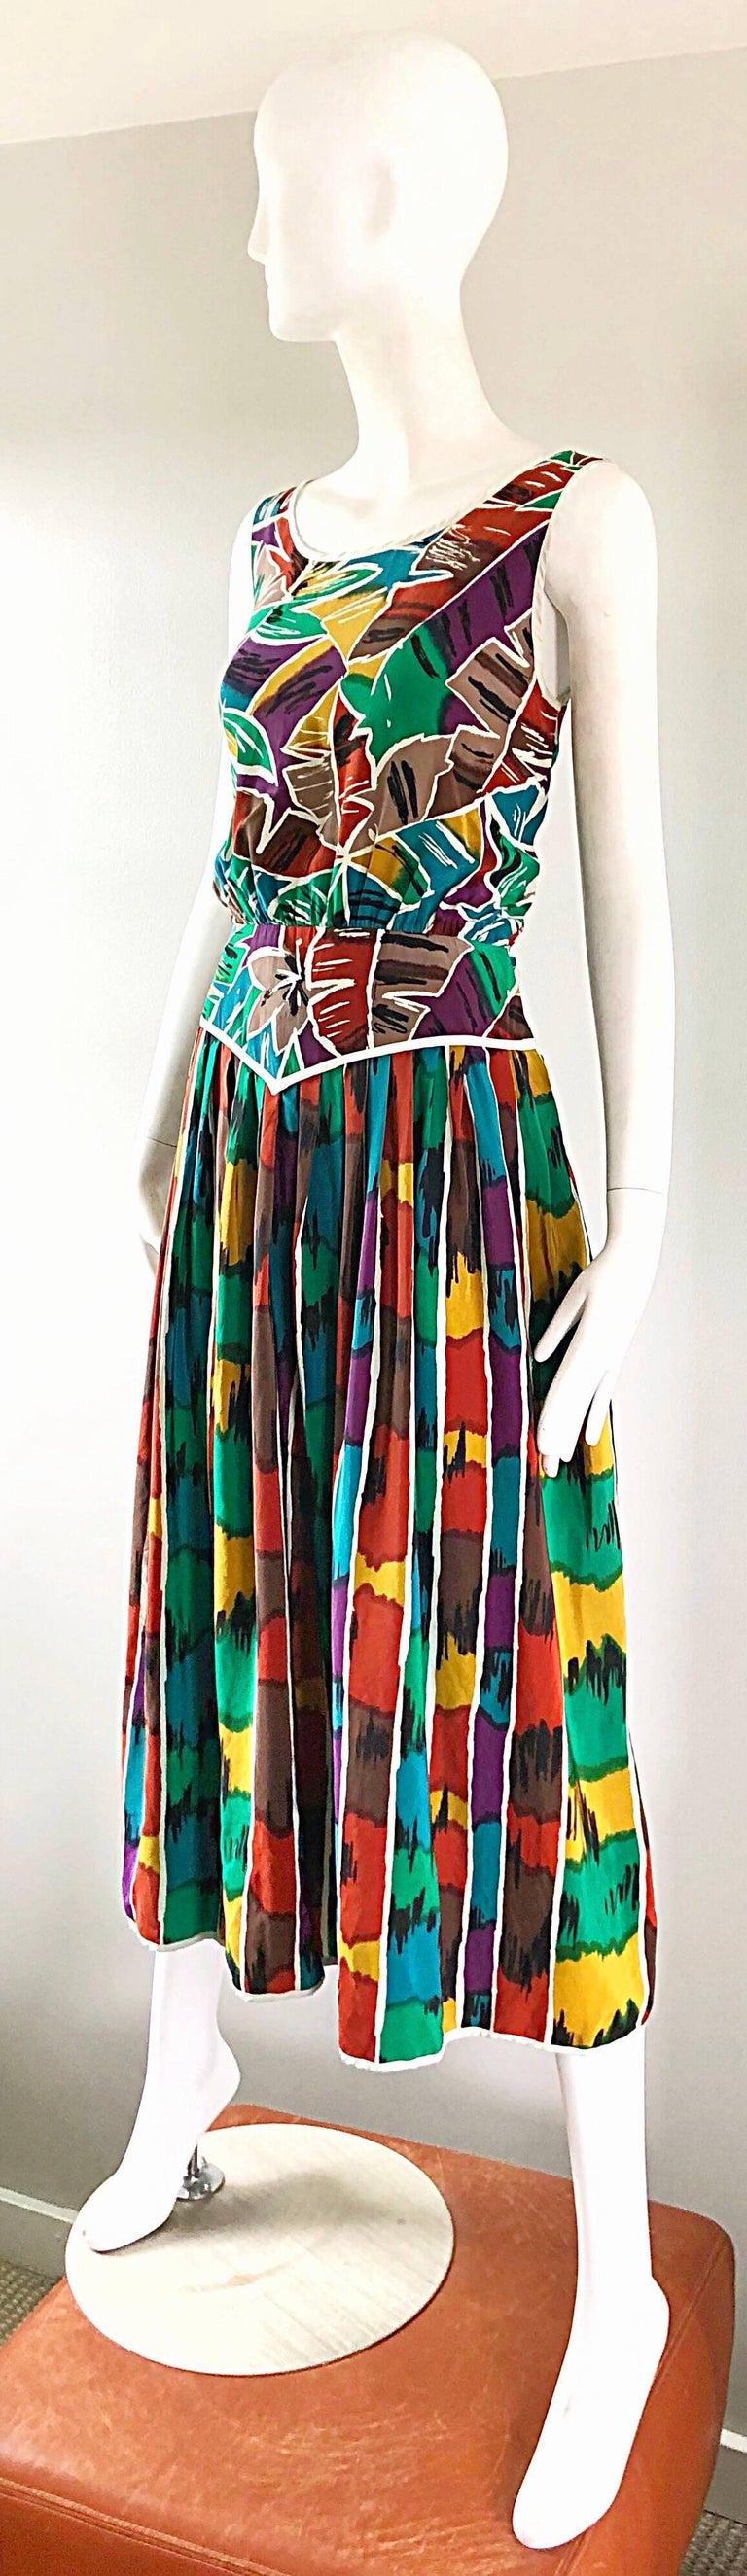 Vintage Oscar de la Renta Size 8 / 10 Kaleidoscope Print Silk Sleeveless Dress For Sale 8